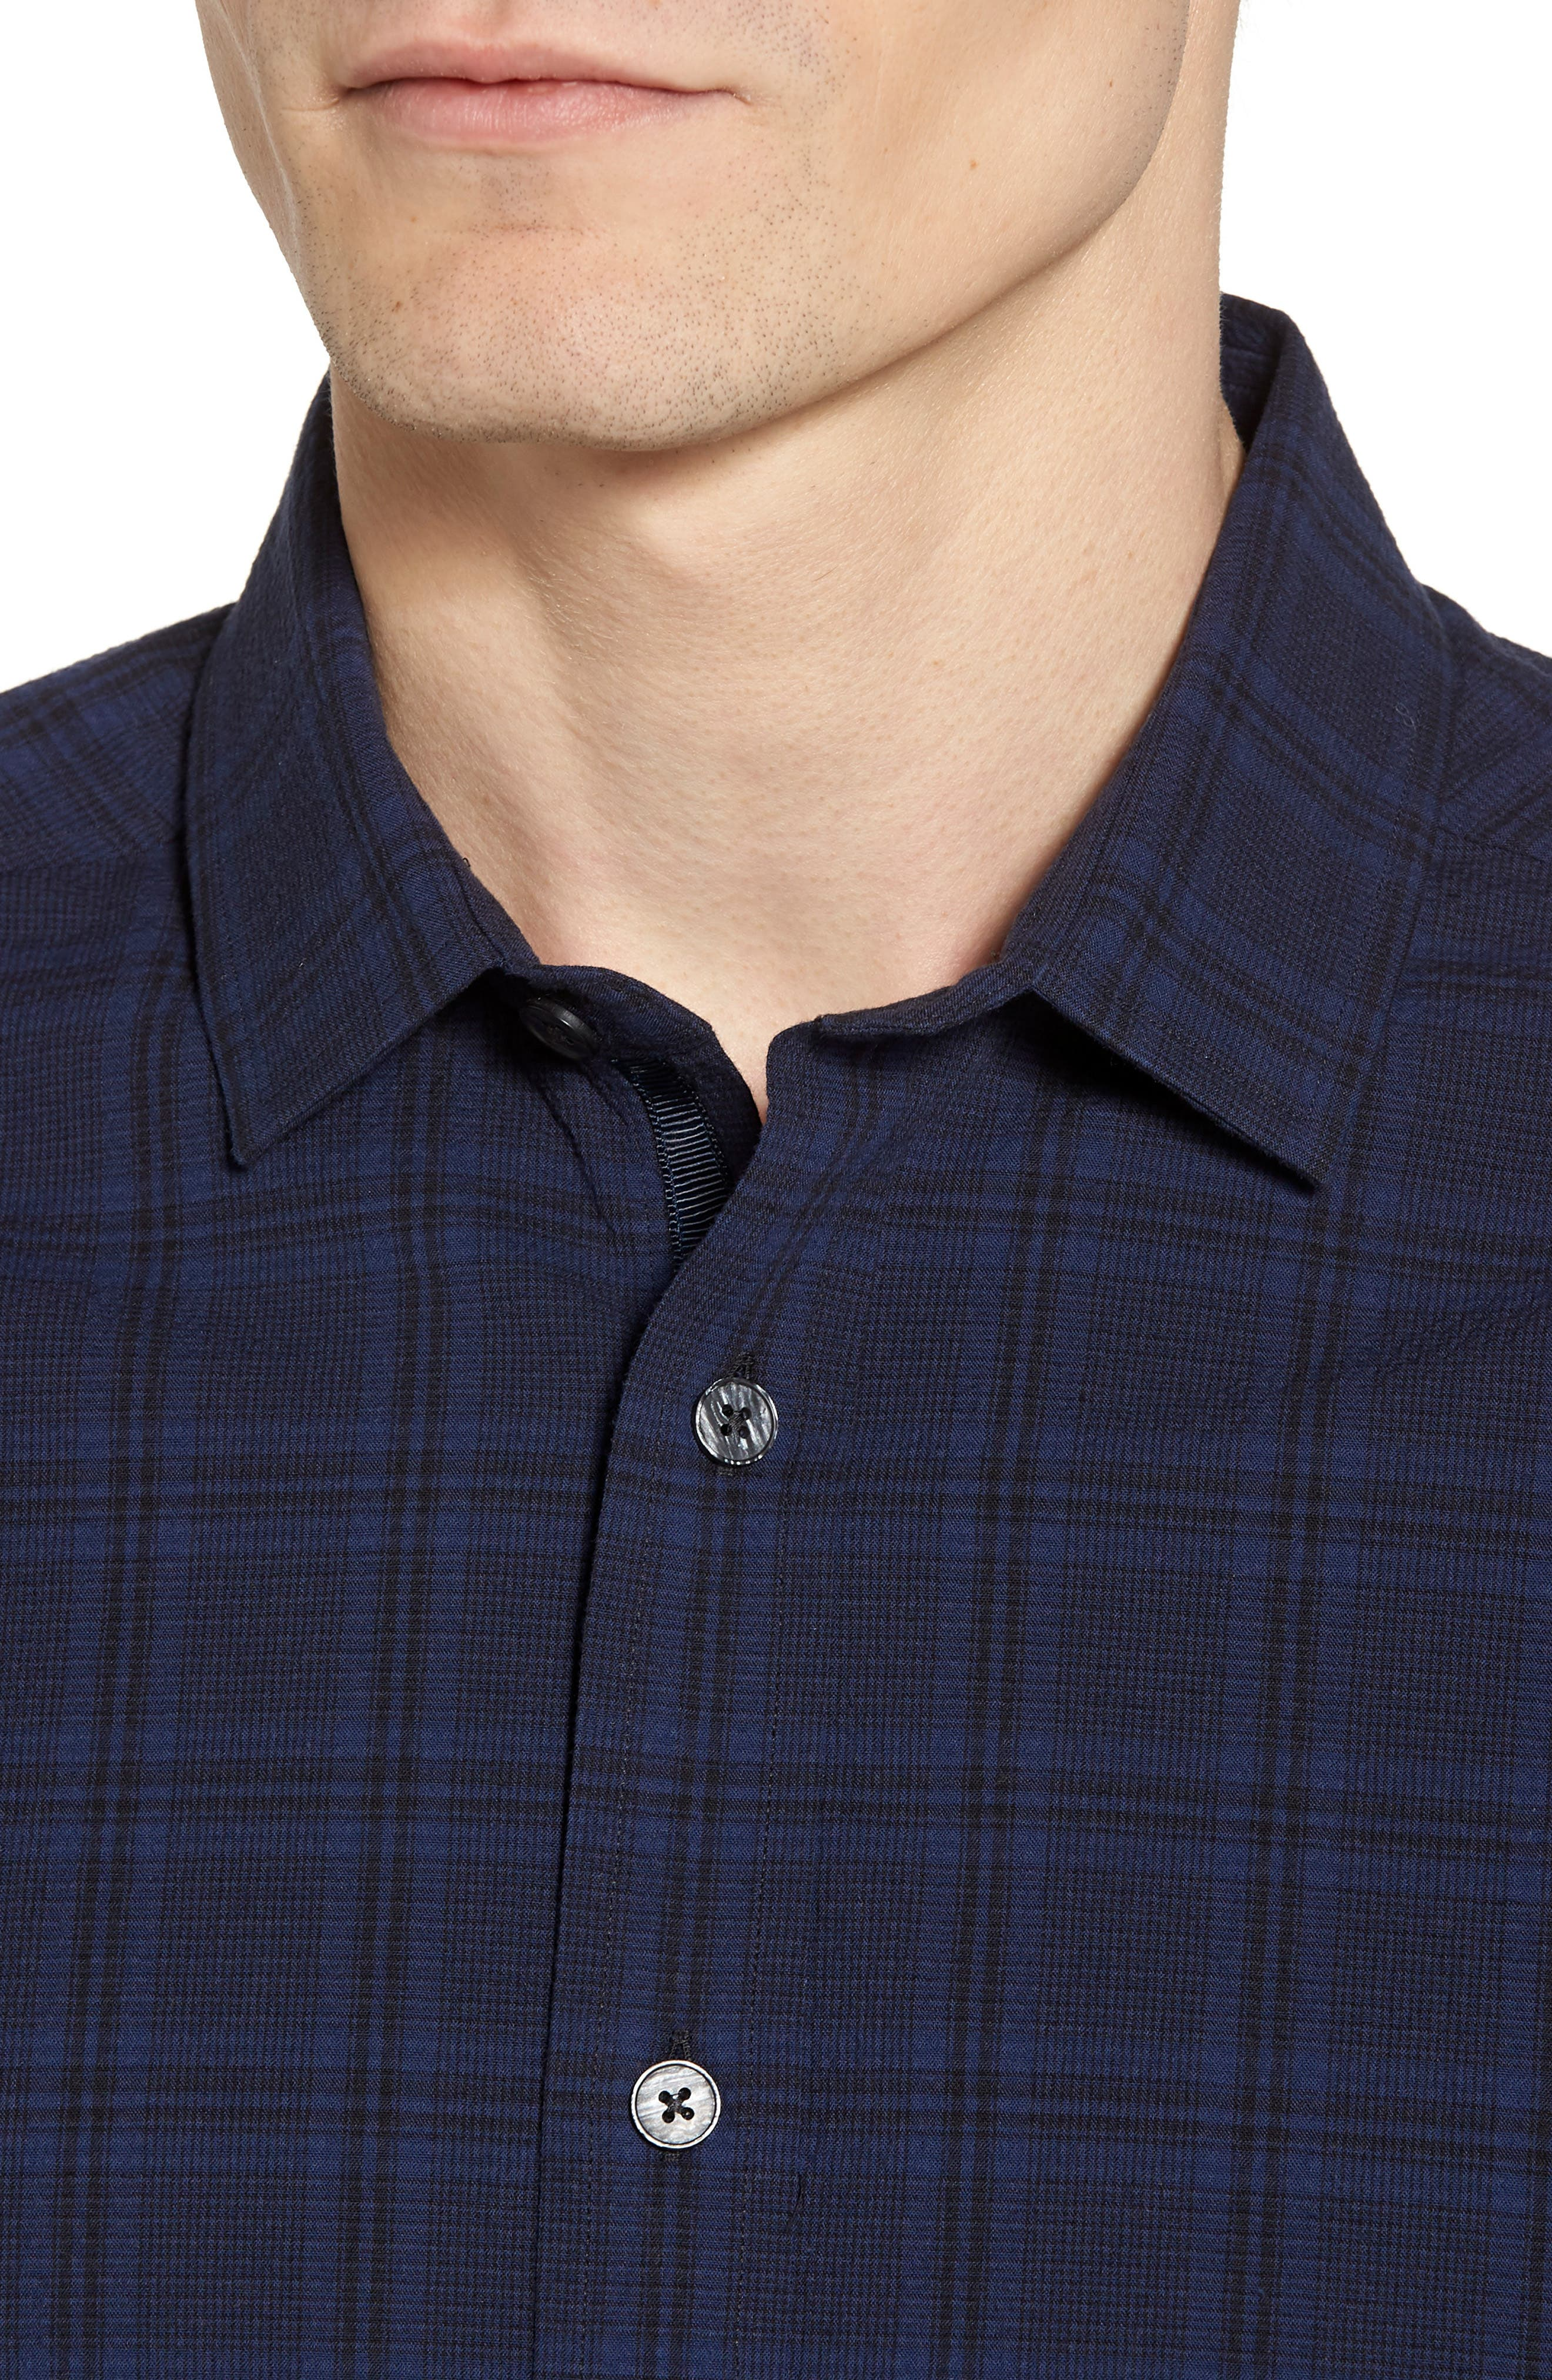 Slim Fit Plaid Stretch Sport Shirt,                             Alternate thumbnail 4, color,                             Navy Seersucker Plaid